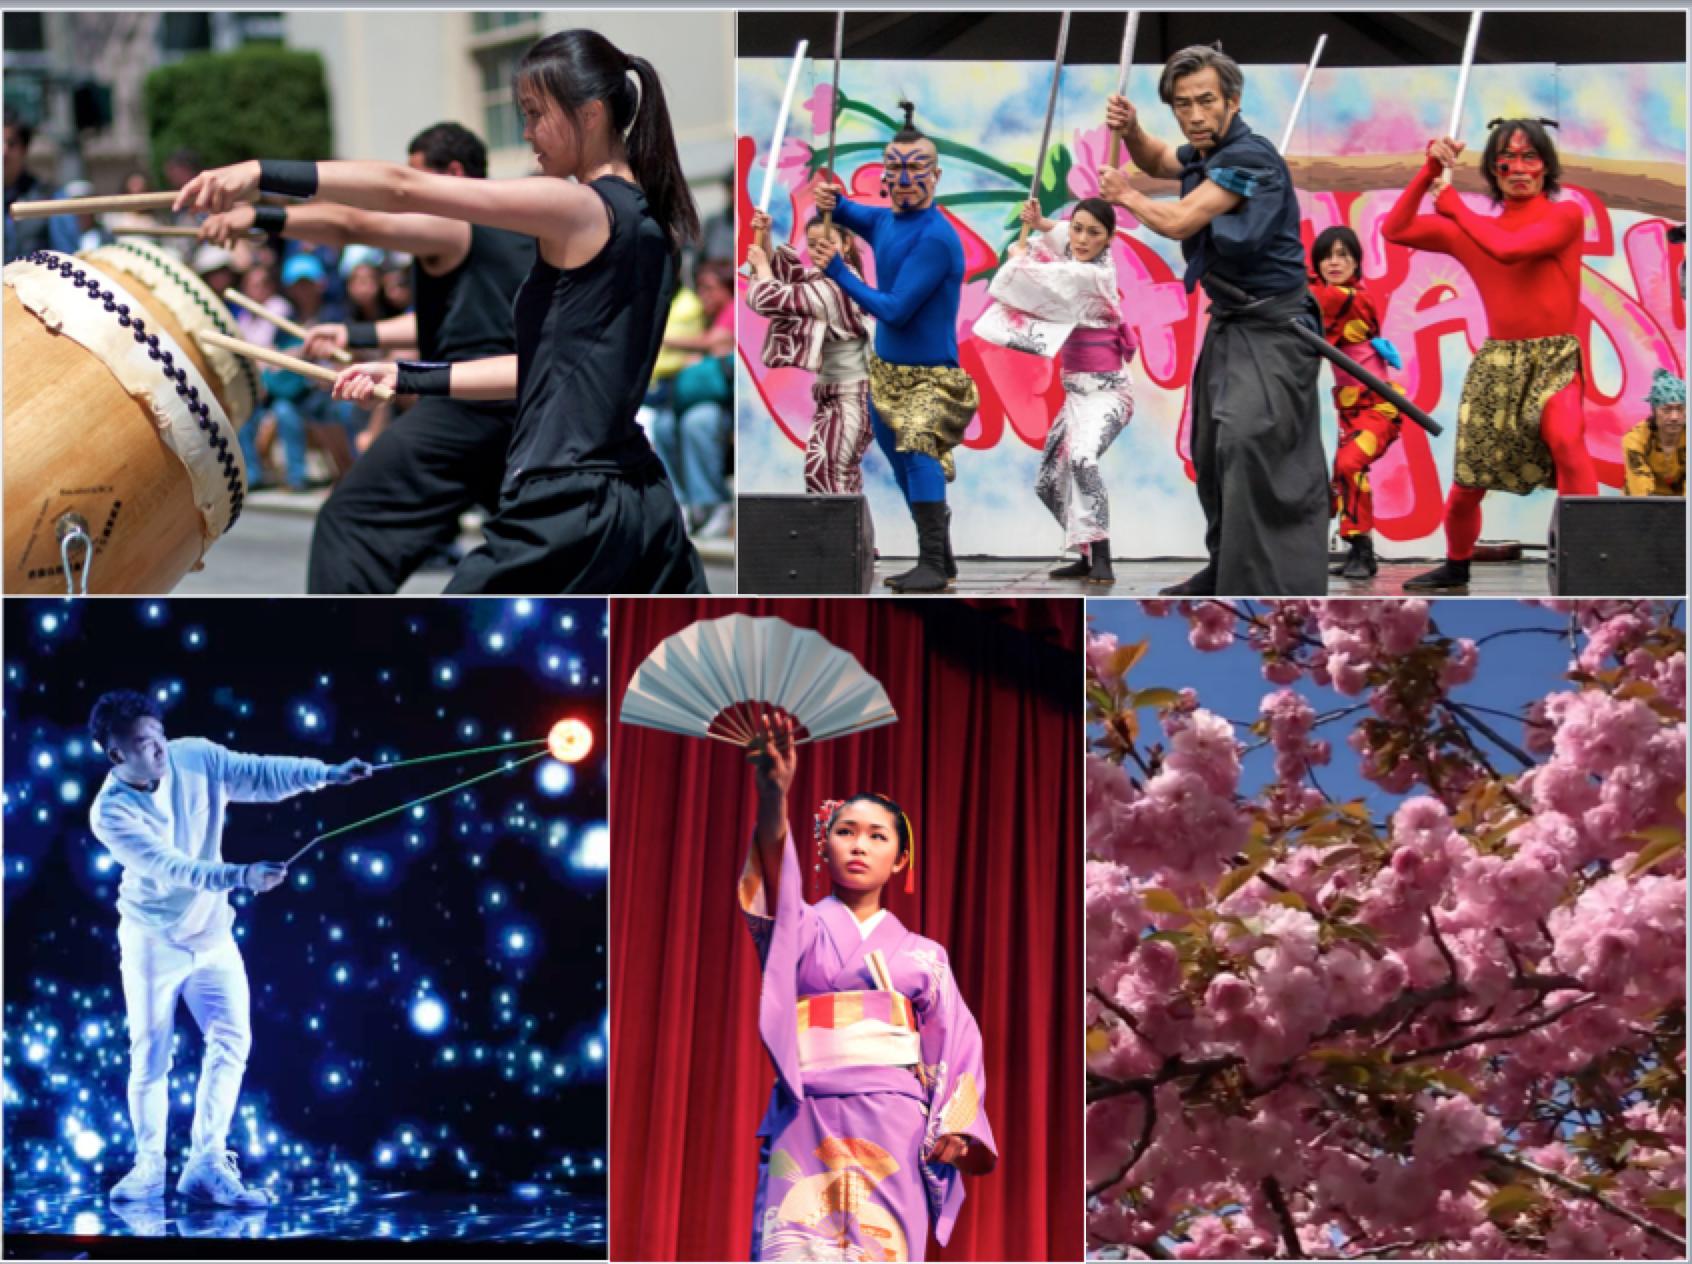 Philadelphia Cherry Blossom Festival 2020.2019 Cherry Blossom Festivals Across The United States